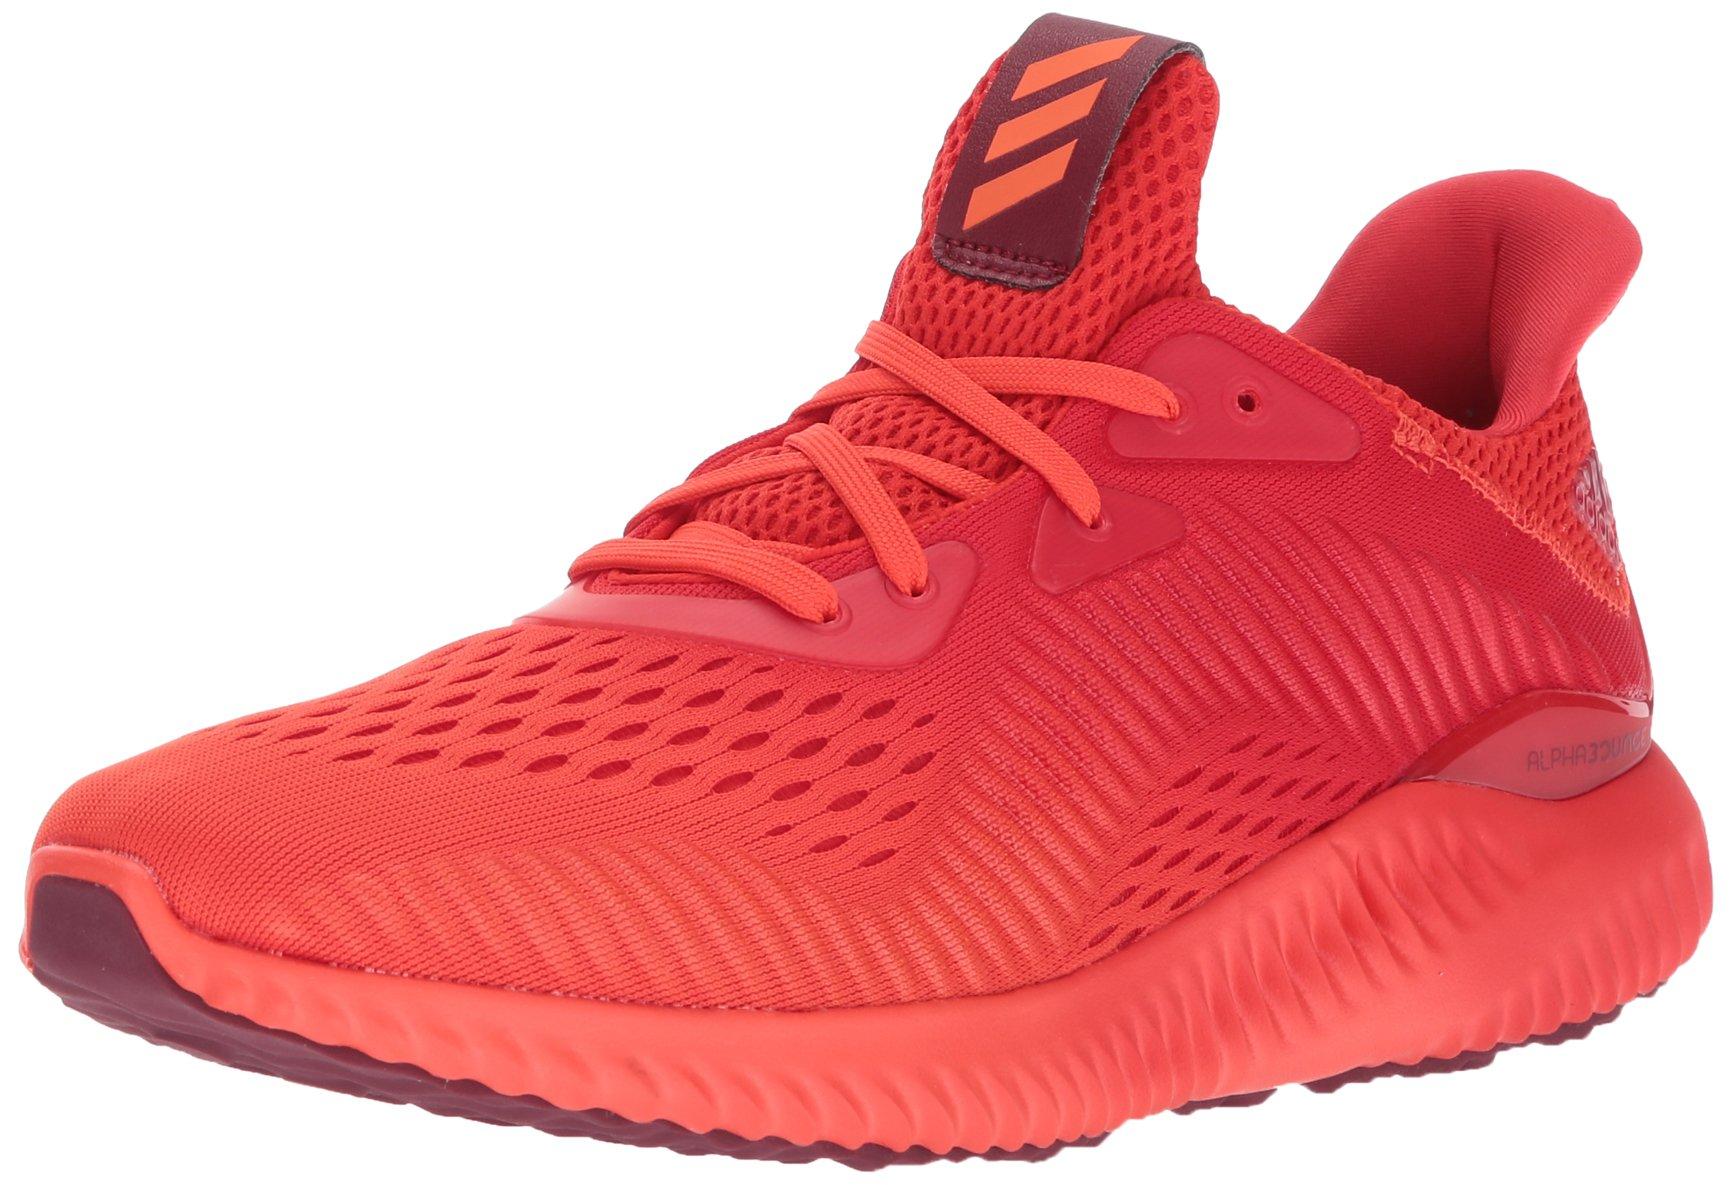 official photos 48614 88975 Galleon - Adidas Mens Alphabounce Em M Running Shoe, Blaze OrangeCORE  REDCollegiate Burgundy, 12 Medium US